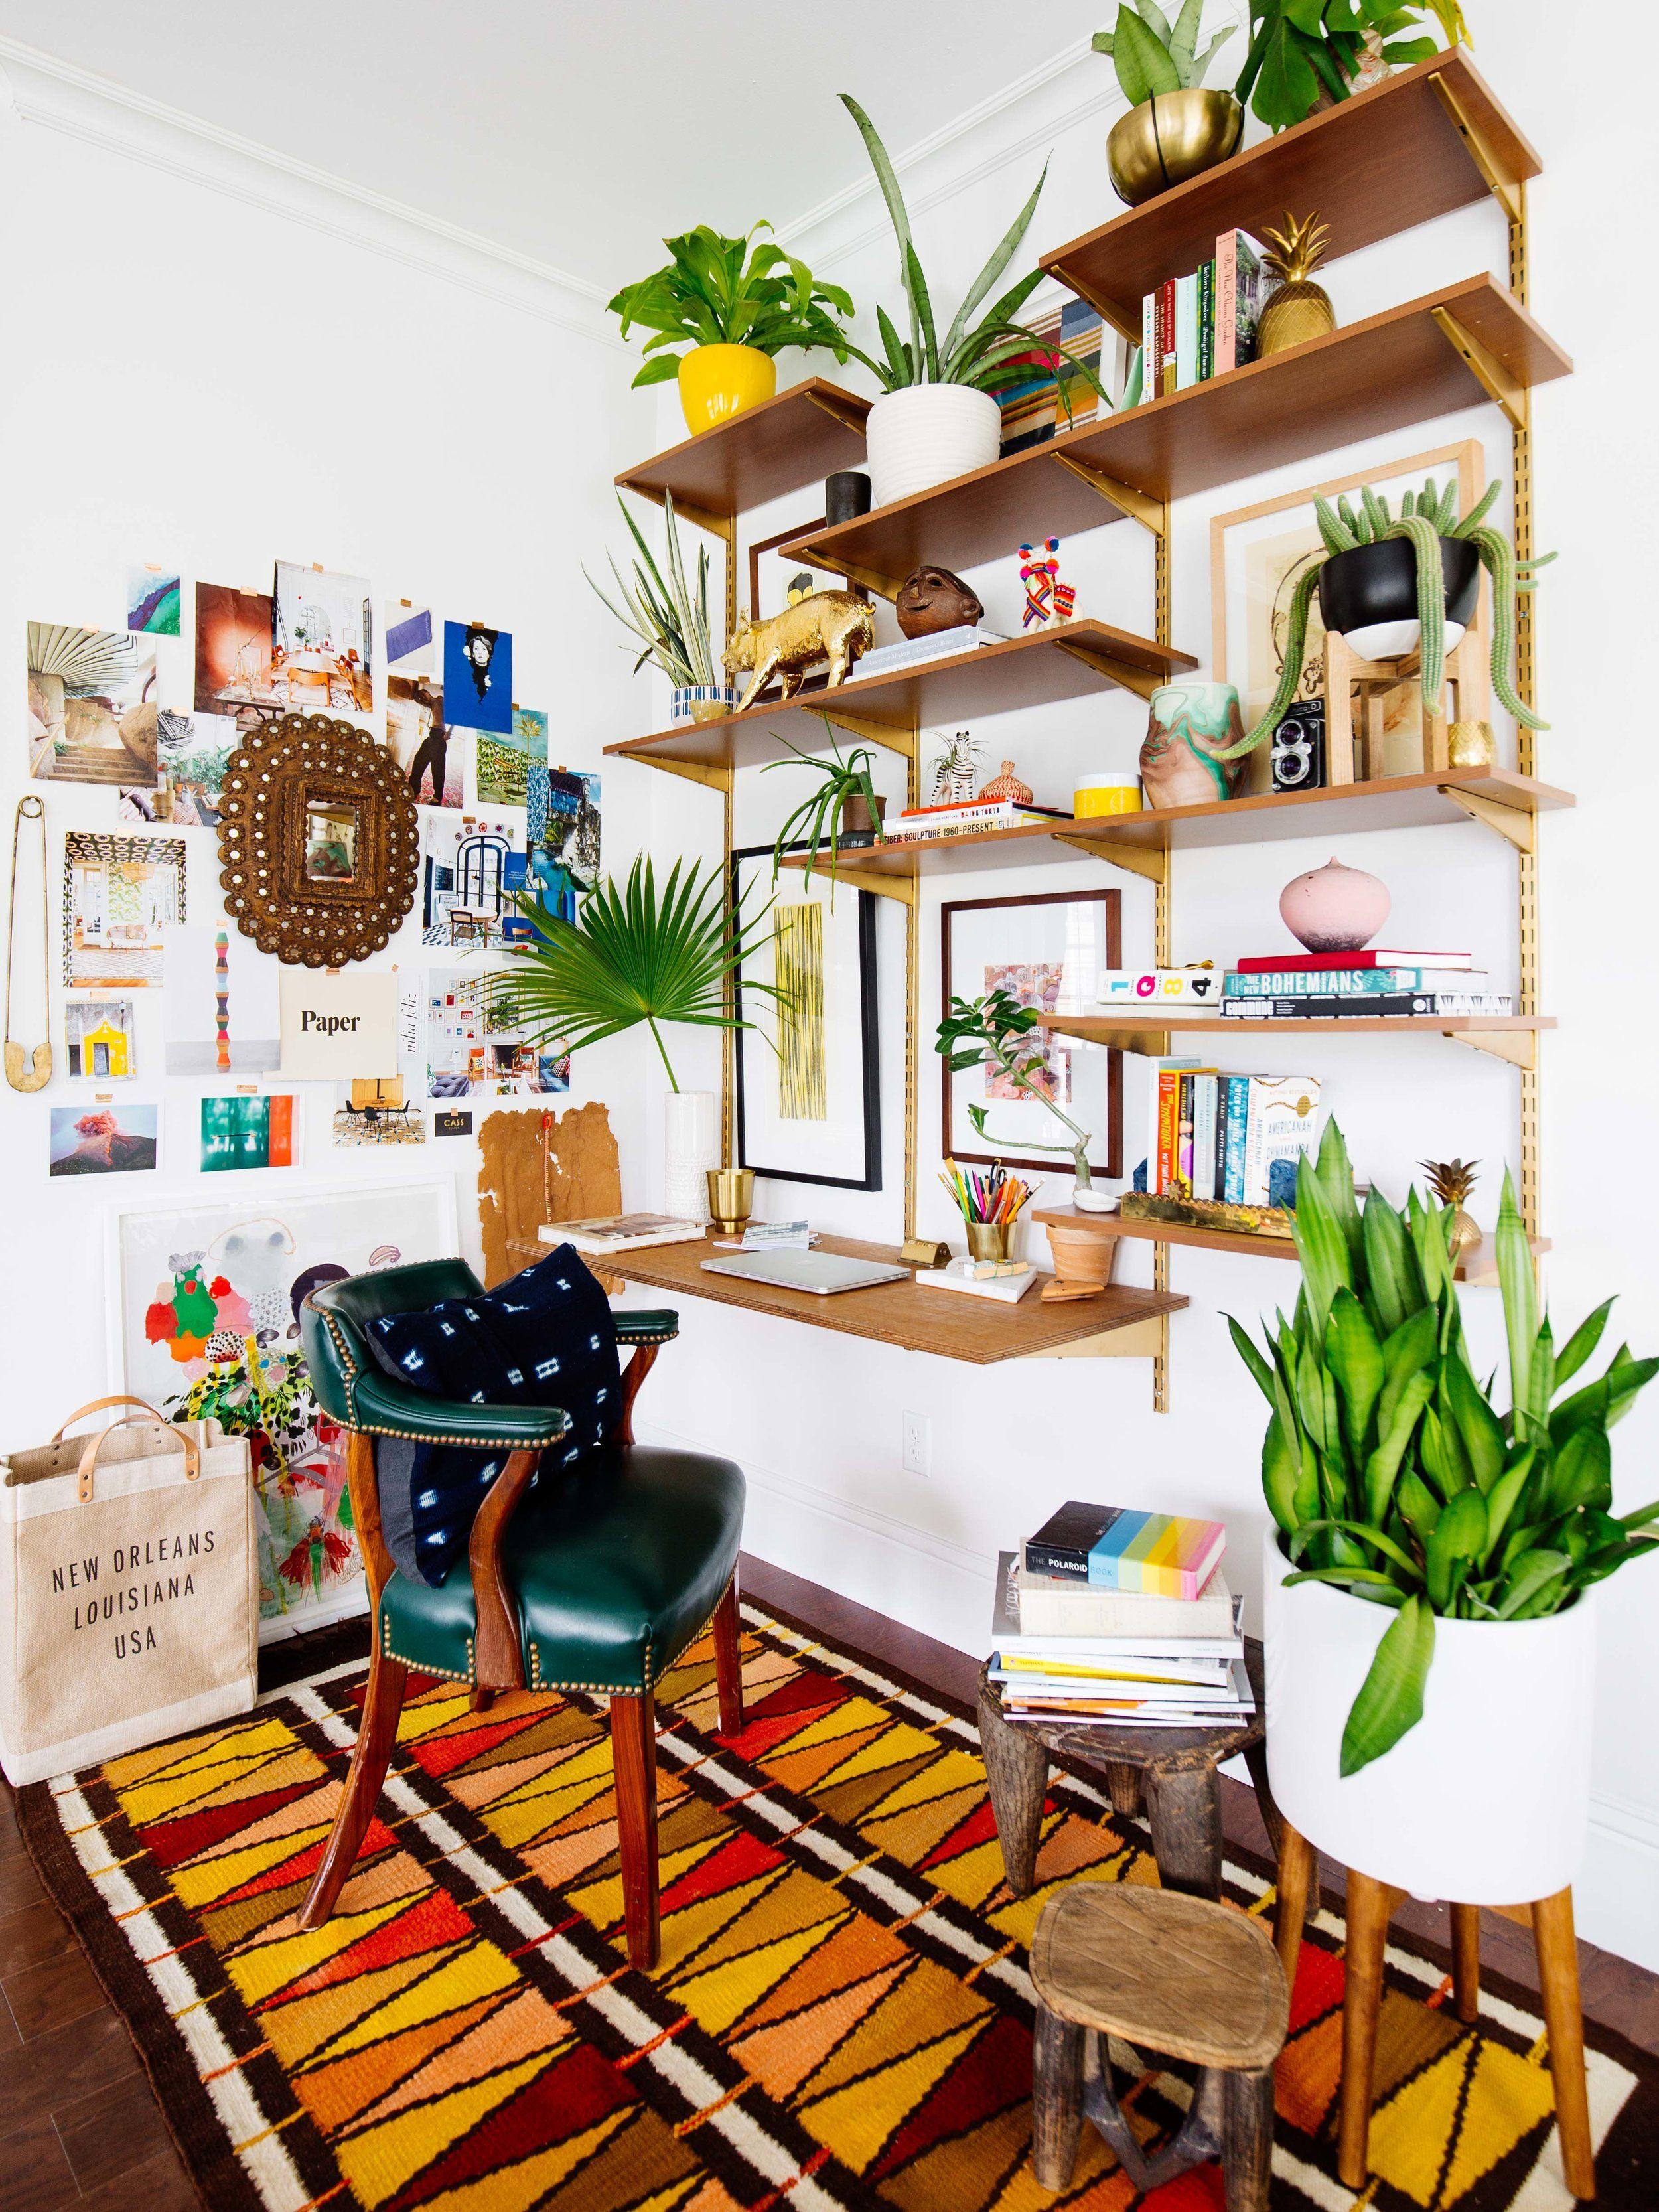 15 small house interior design ideas how to decorate a small spaceSmall Space House Interior Design #11